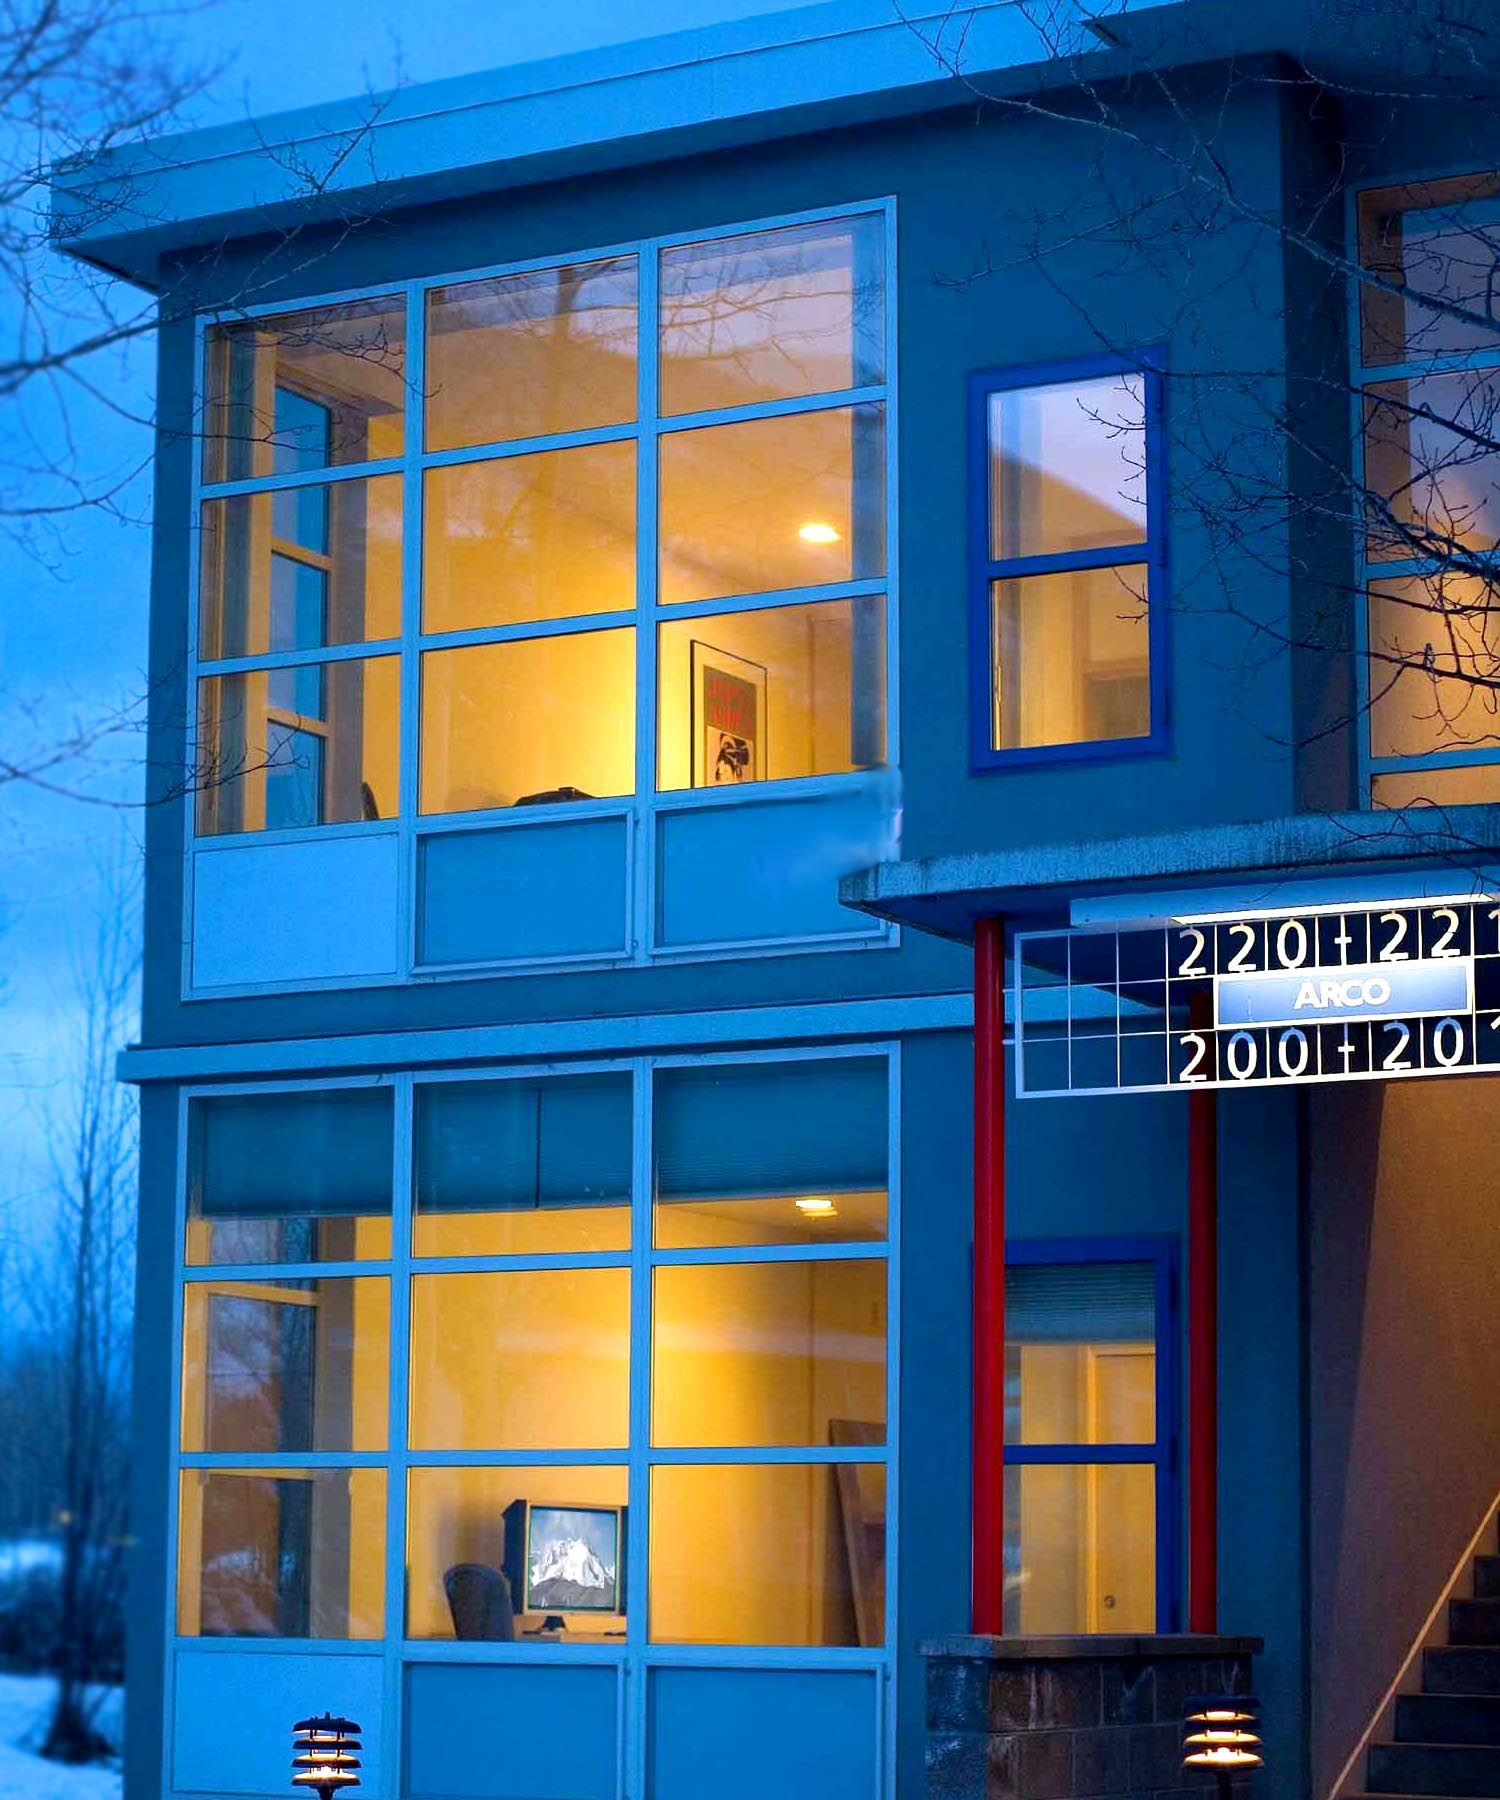 Simple yet elegant, Bauhausinspired architecture and